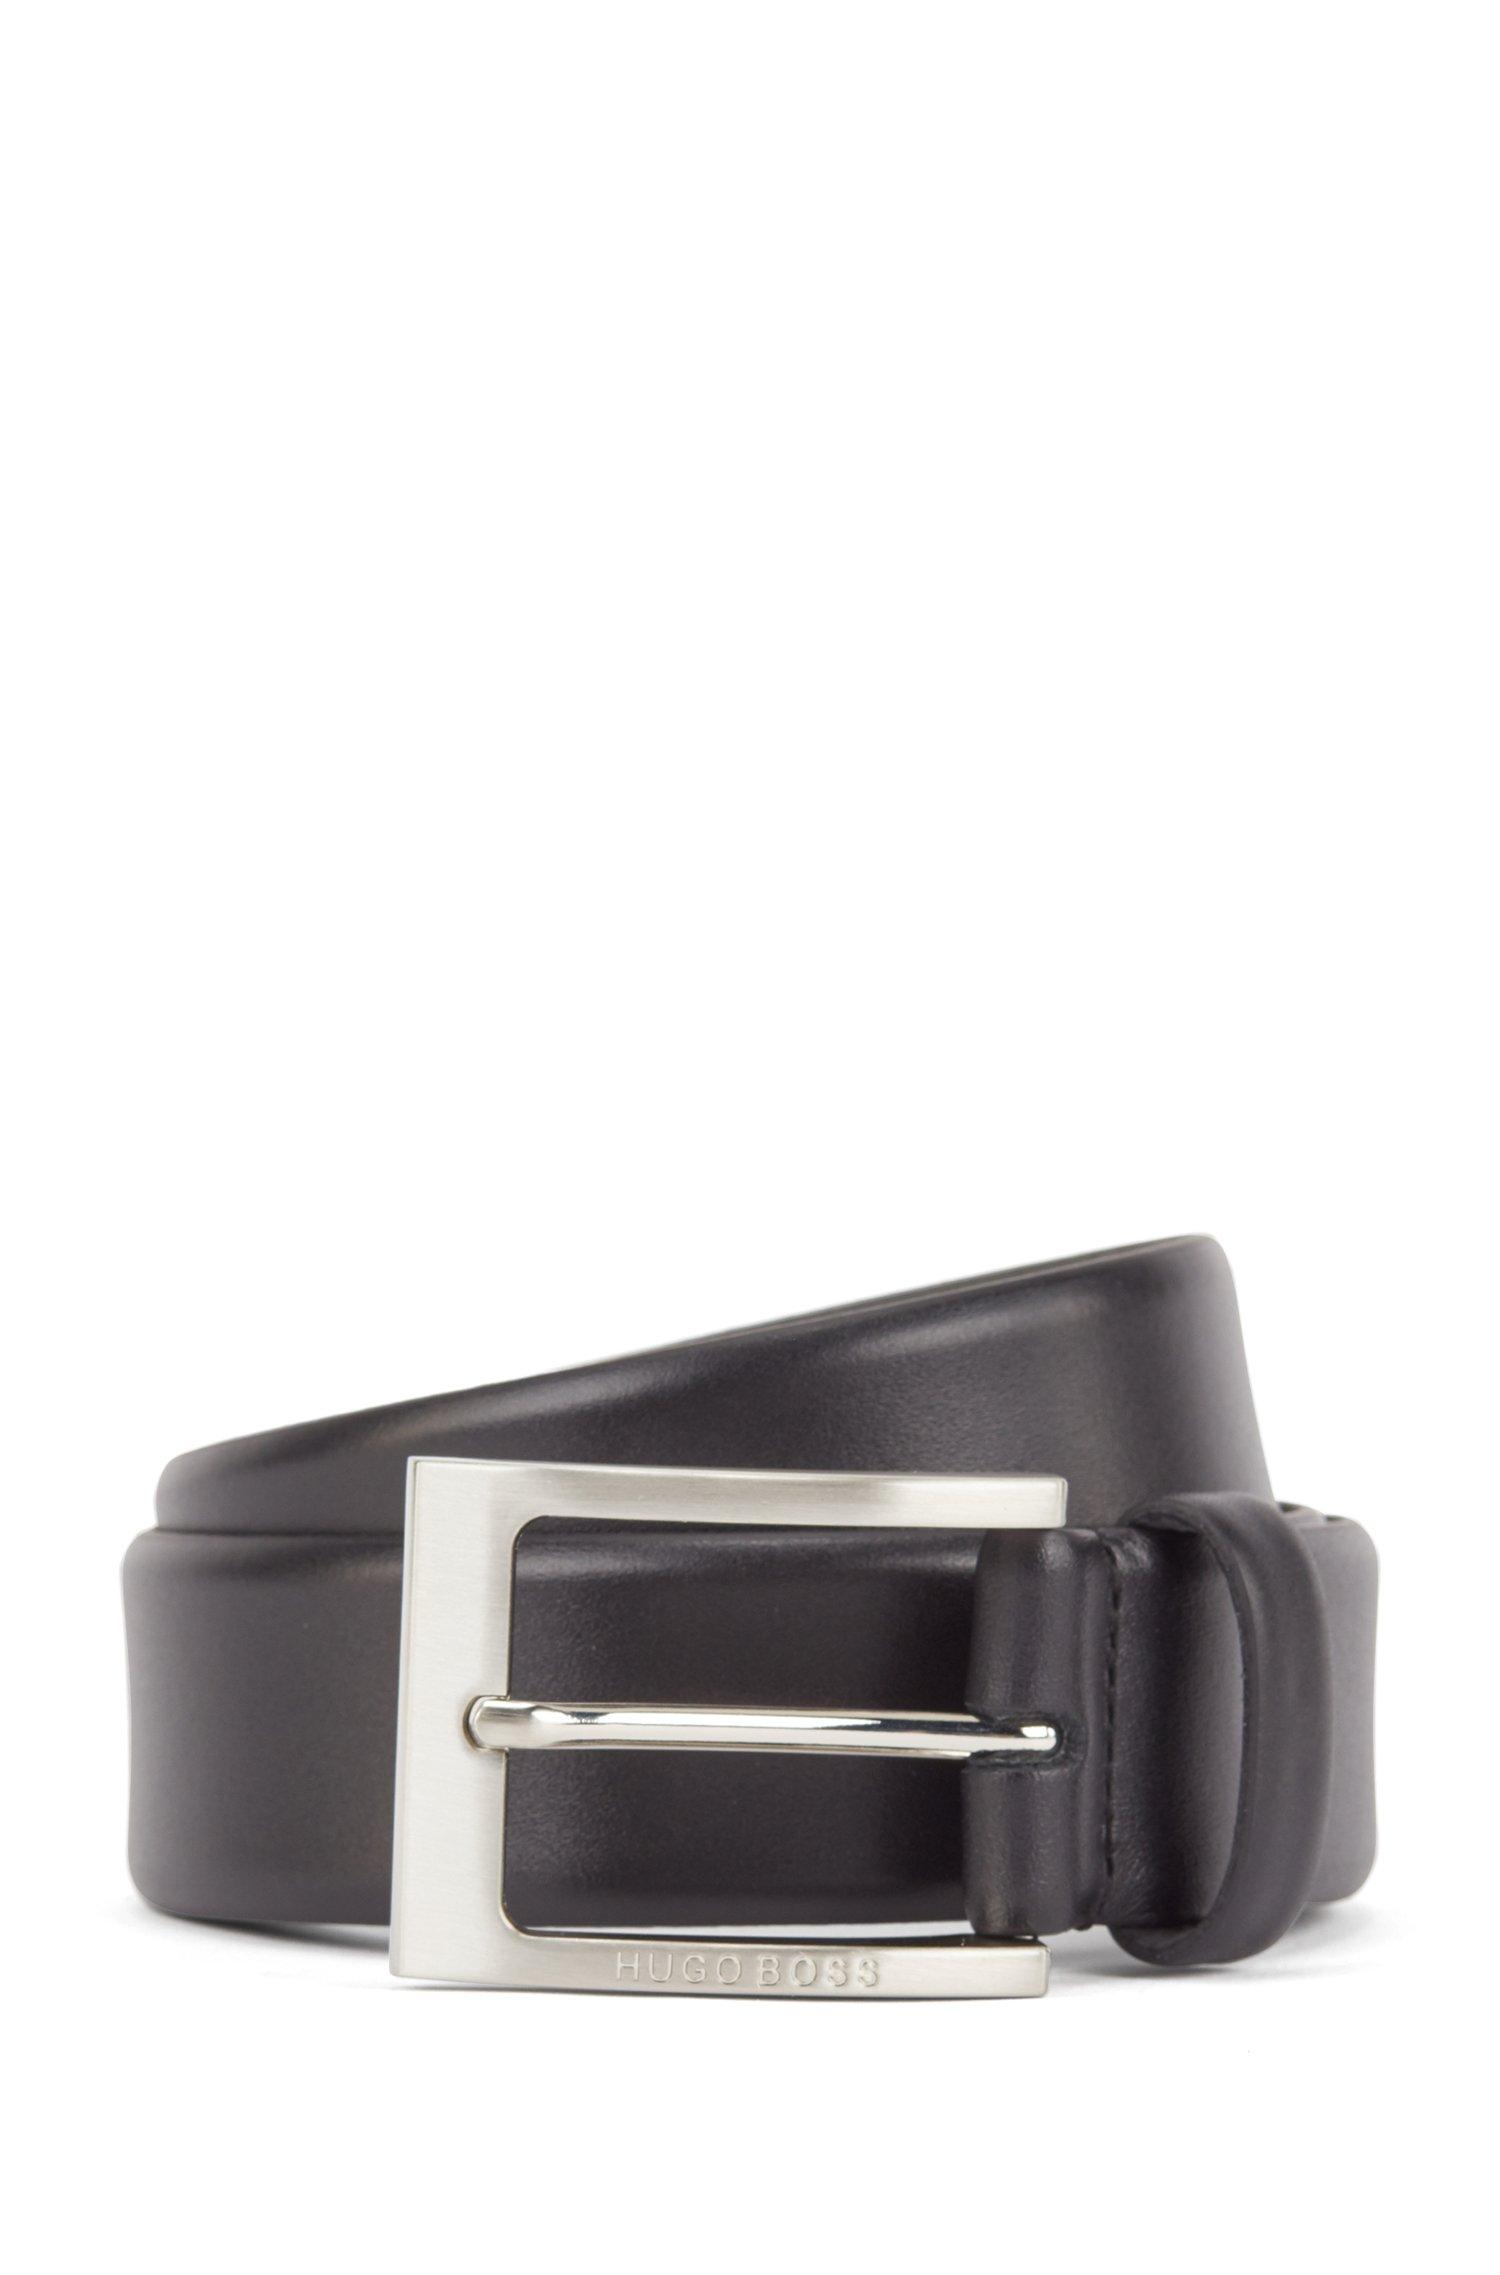 Pin-buckle belt in nappa leather, Black